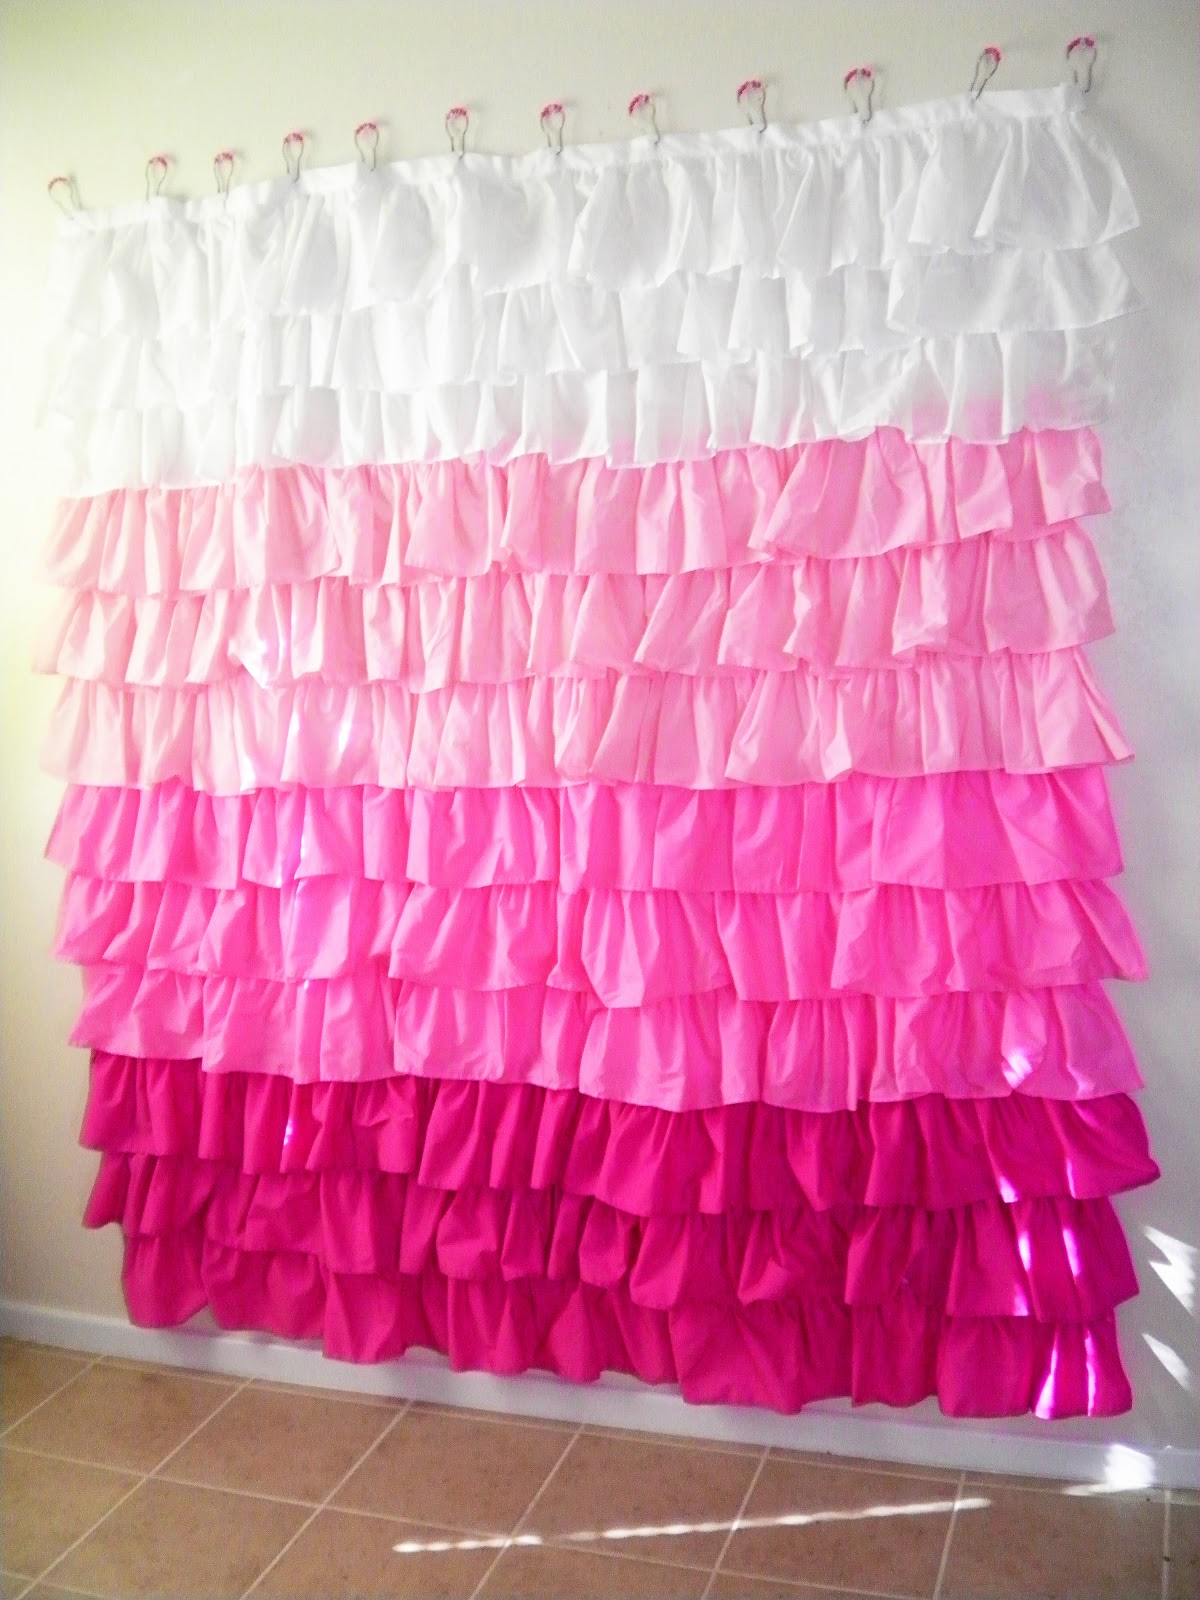 Diy ruffled shower curtain - Diy Ruffled Shower Curtain 7